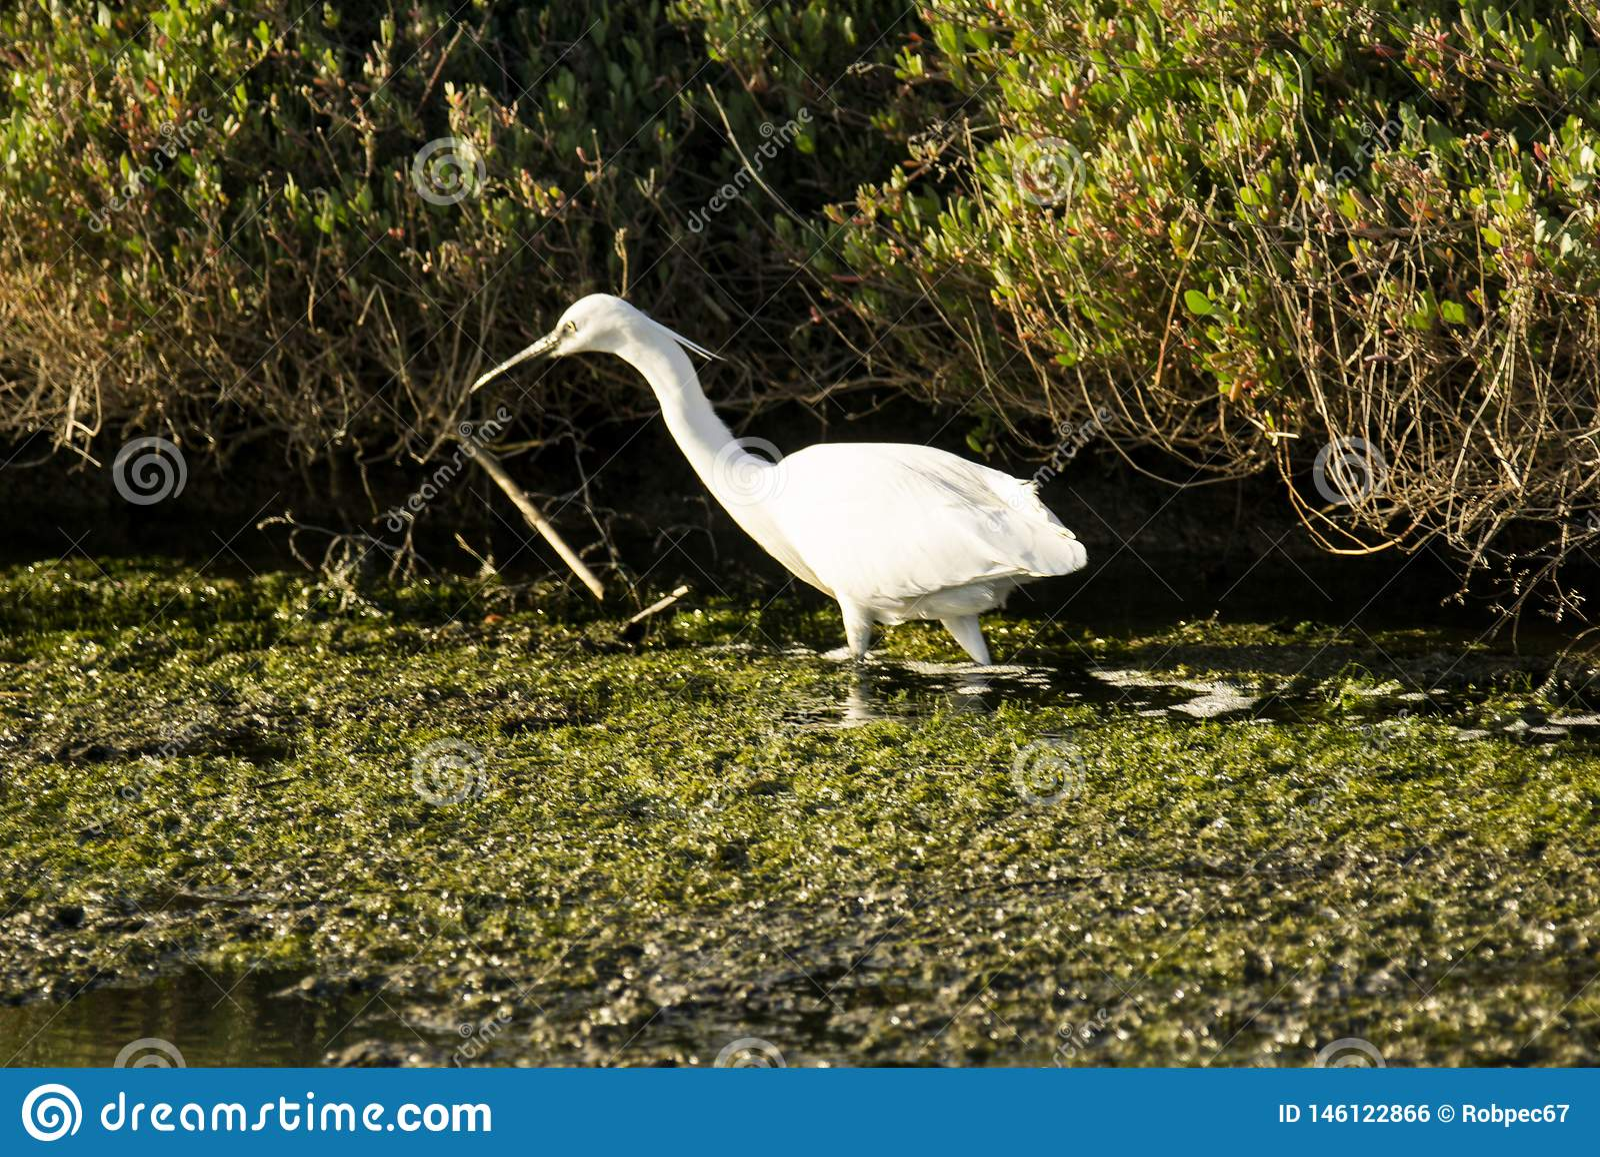 Della Pescaia Гроссето Италии Тосканы Maremma Castiglione, природный заповедник Diaccia Botrona, звероловства цапли в канале